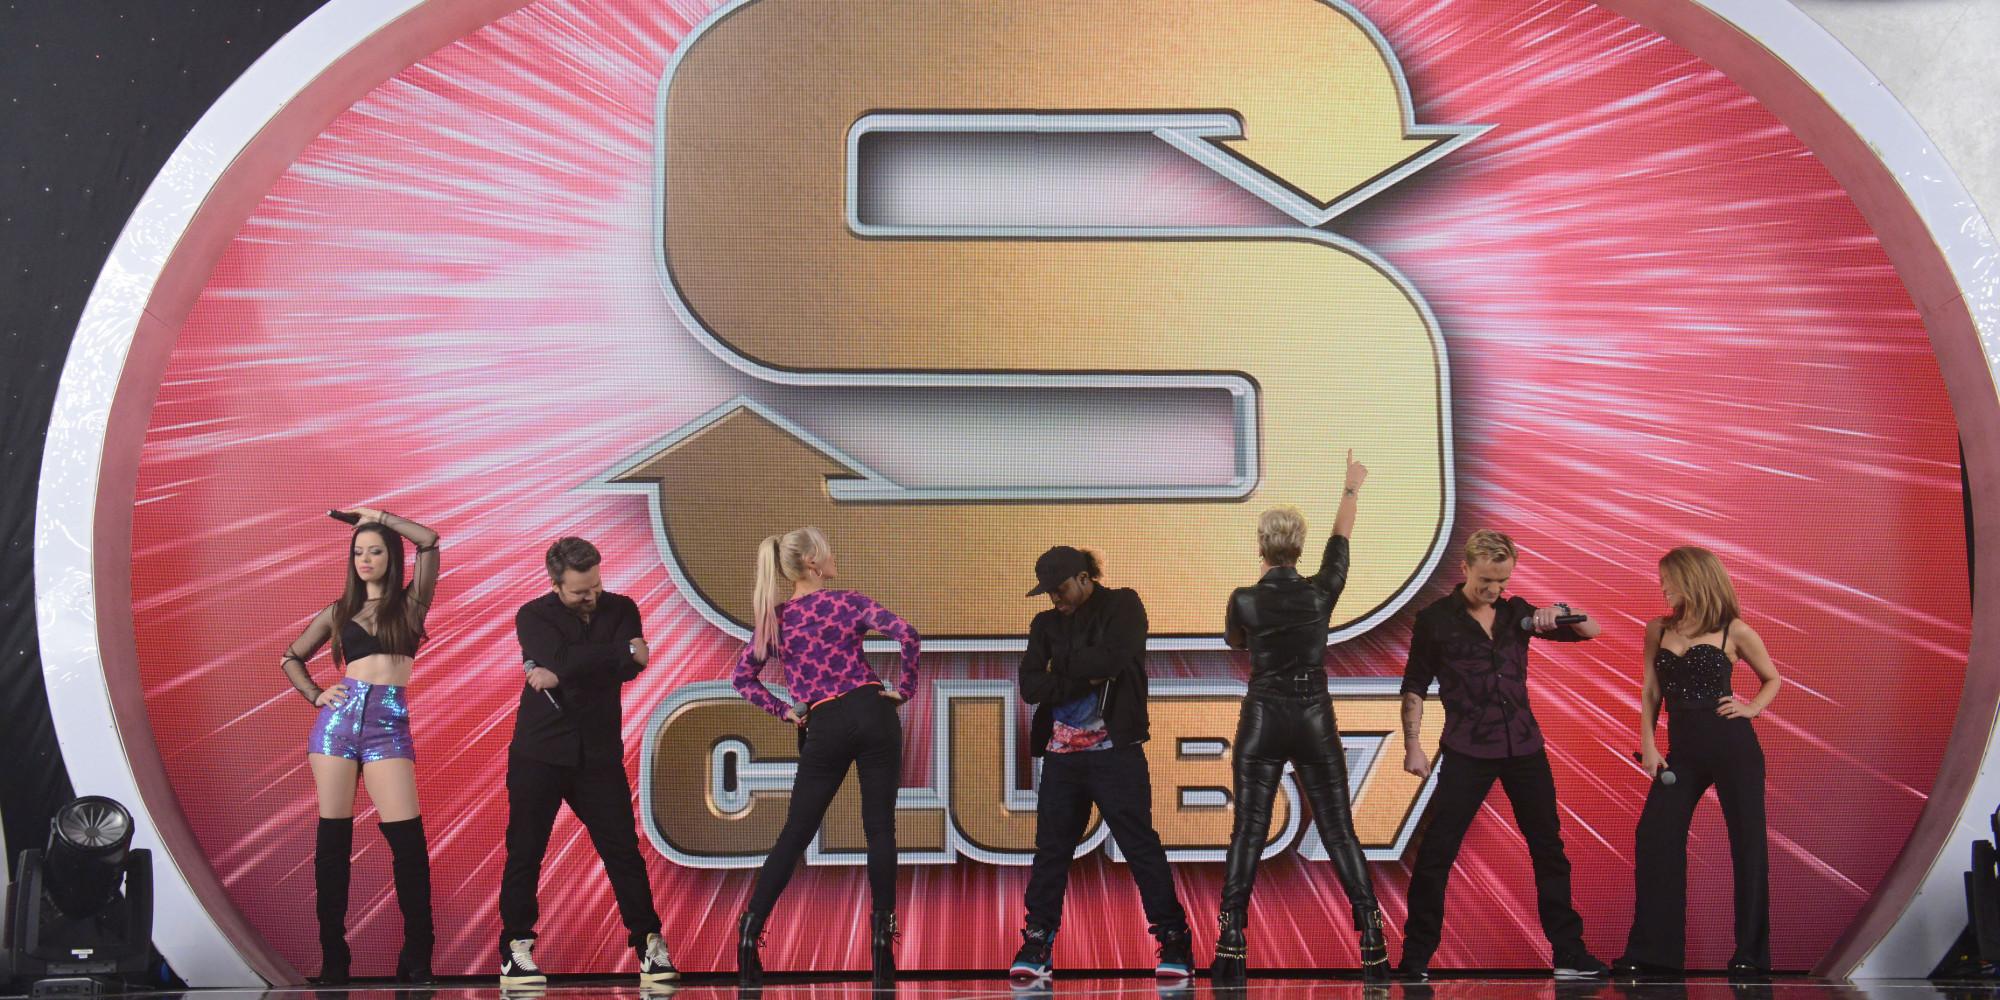 http://www.omgblog.com/media/2014/11/o-S-CLUB-7-facebook.jpg